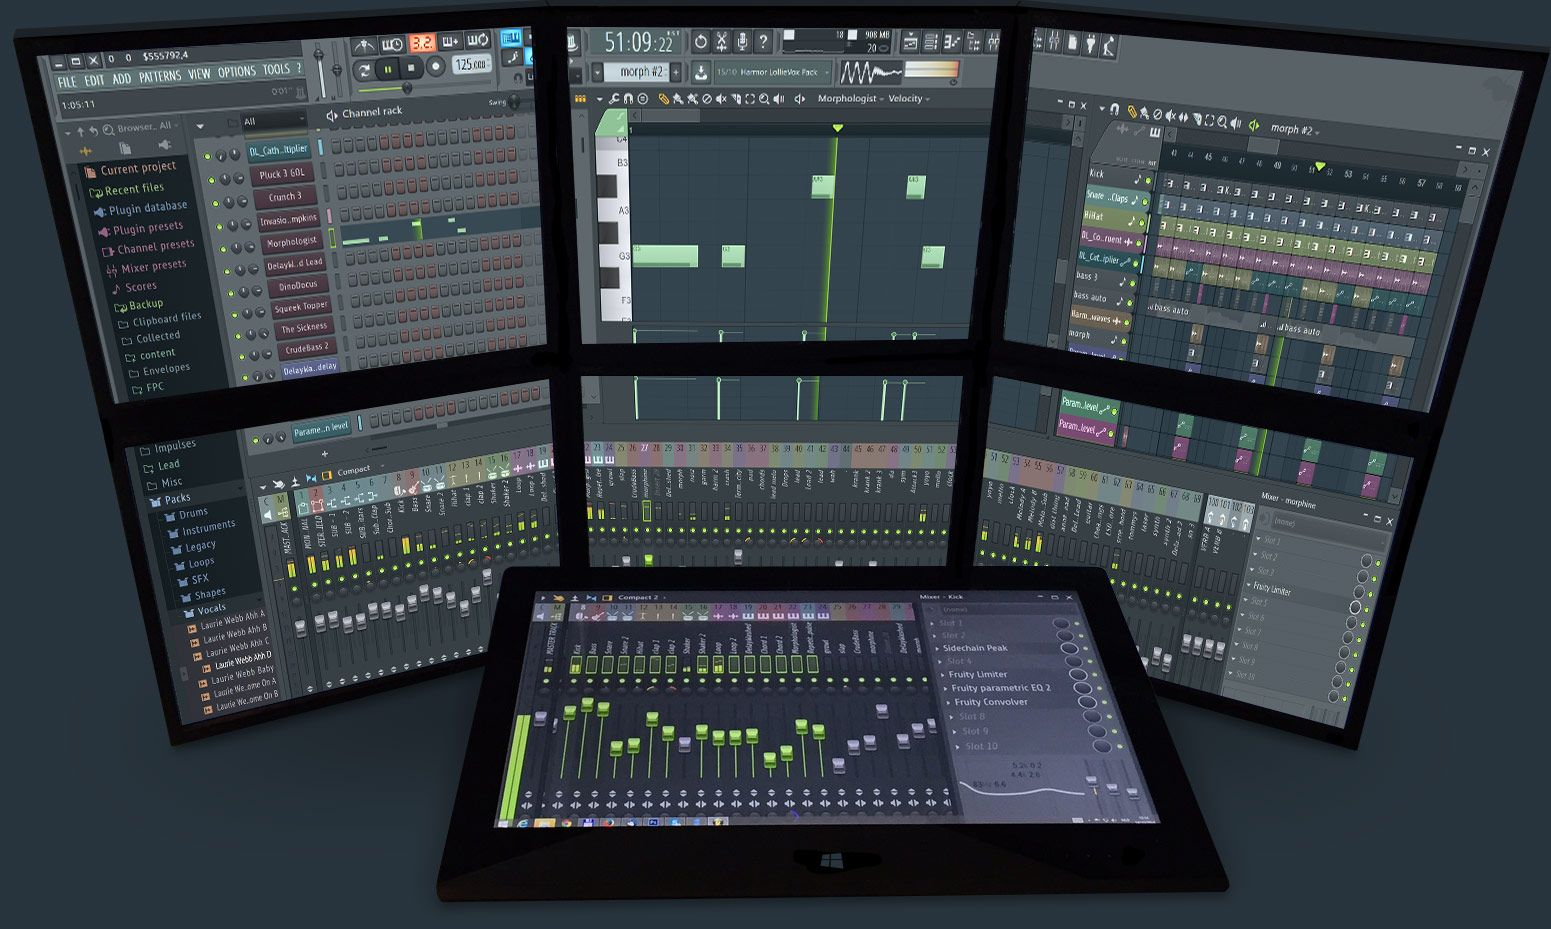 fl studio 12.5.1.5